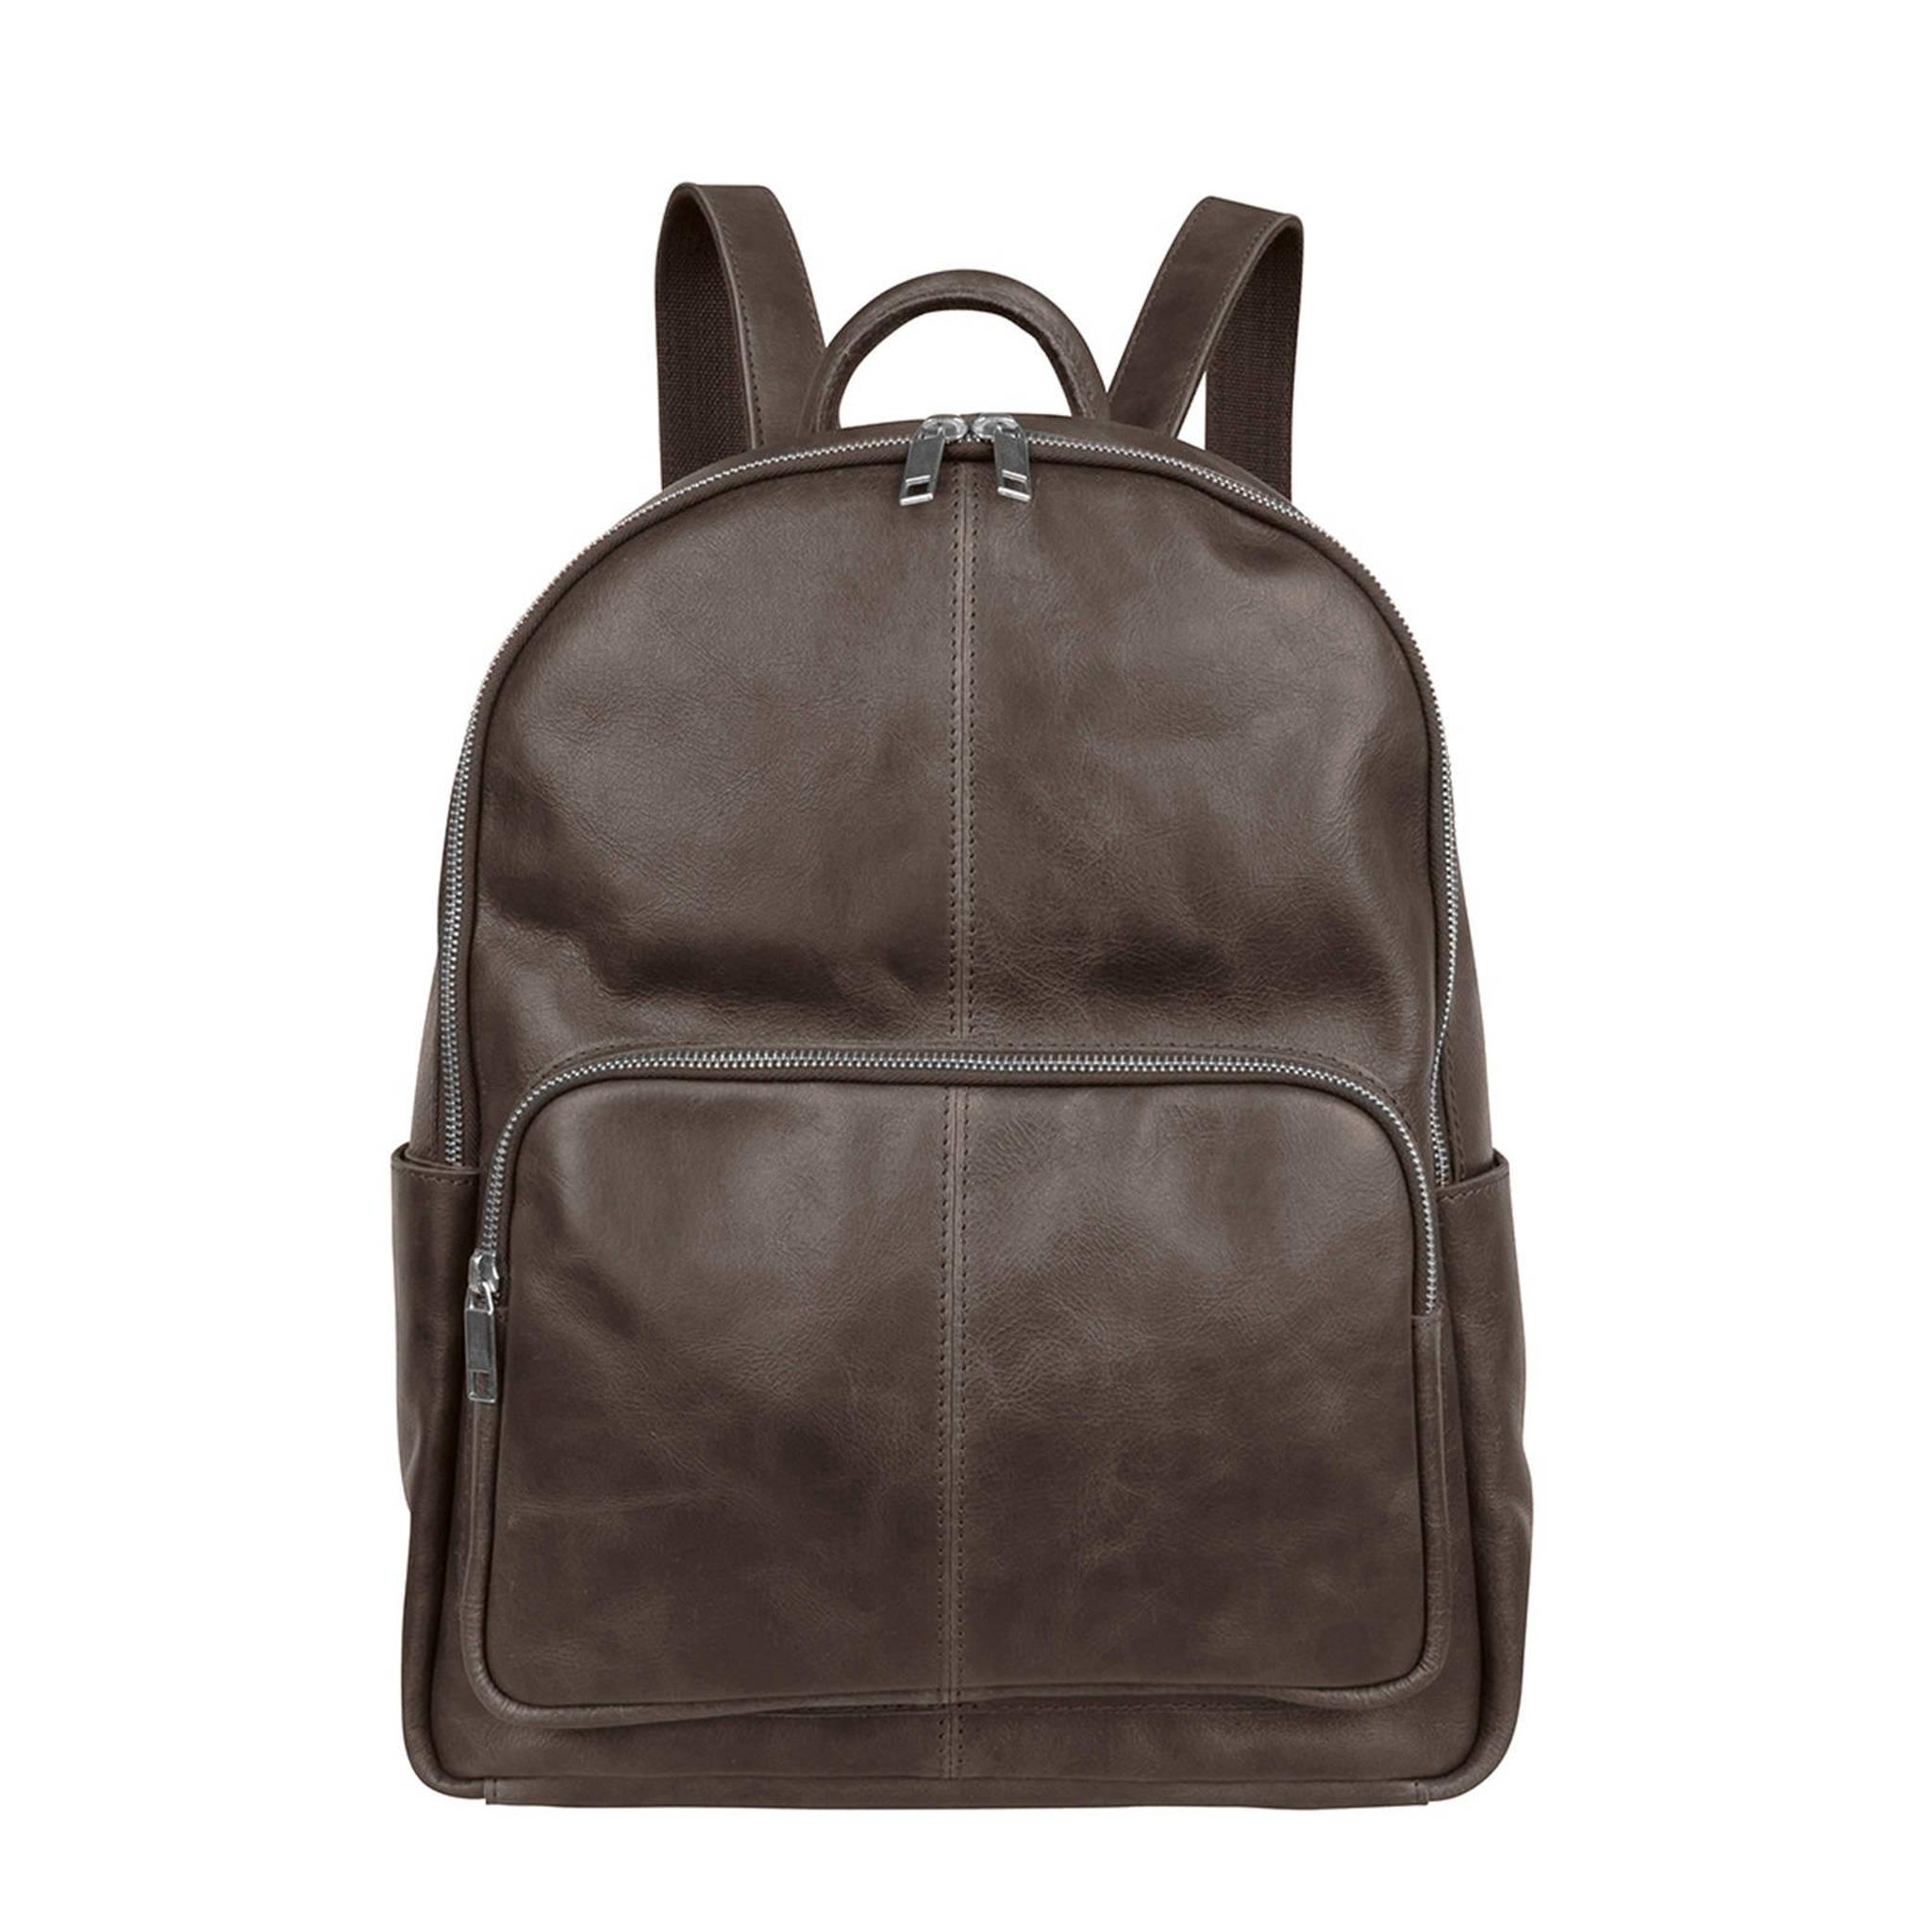 76c2ff7c91d Cowboysbag 13,3 inch Mason leren laptoptas rugzak | wehkamp